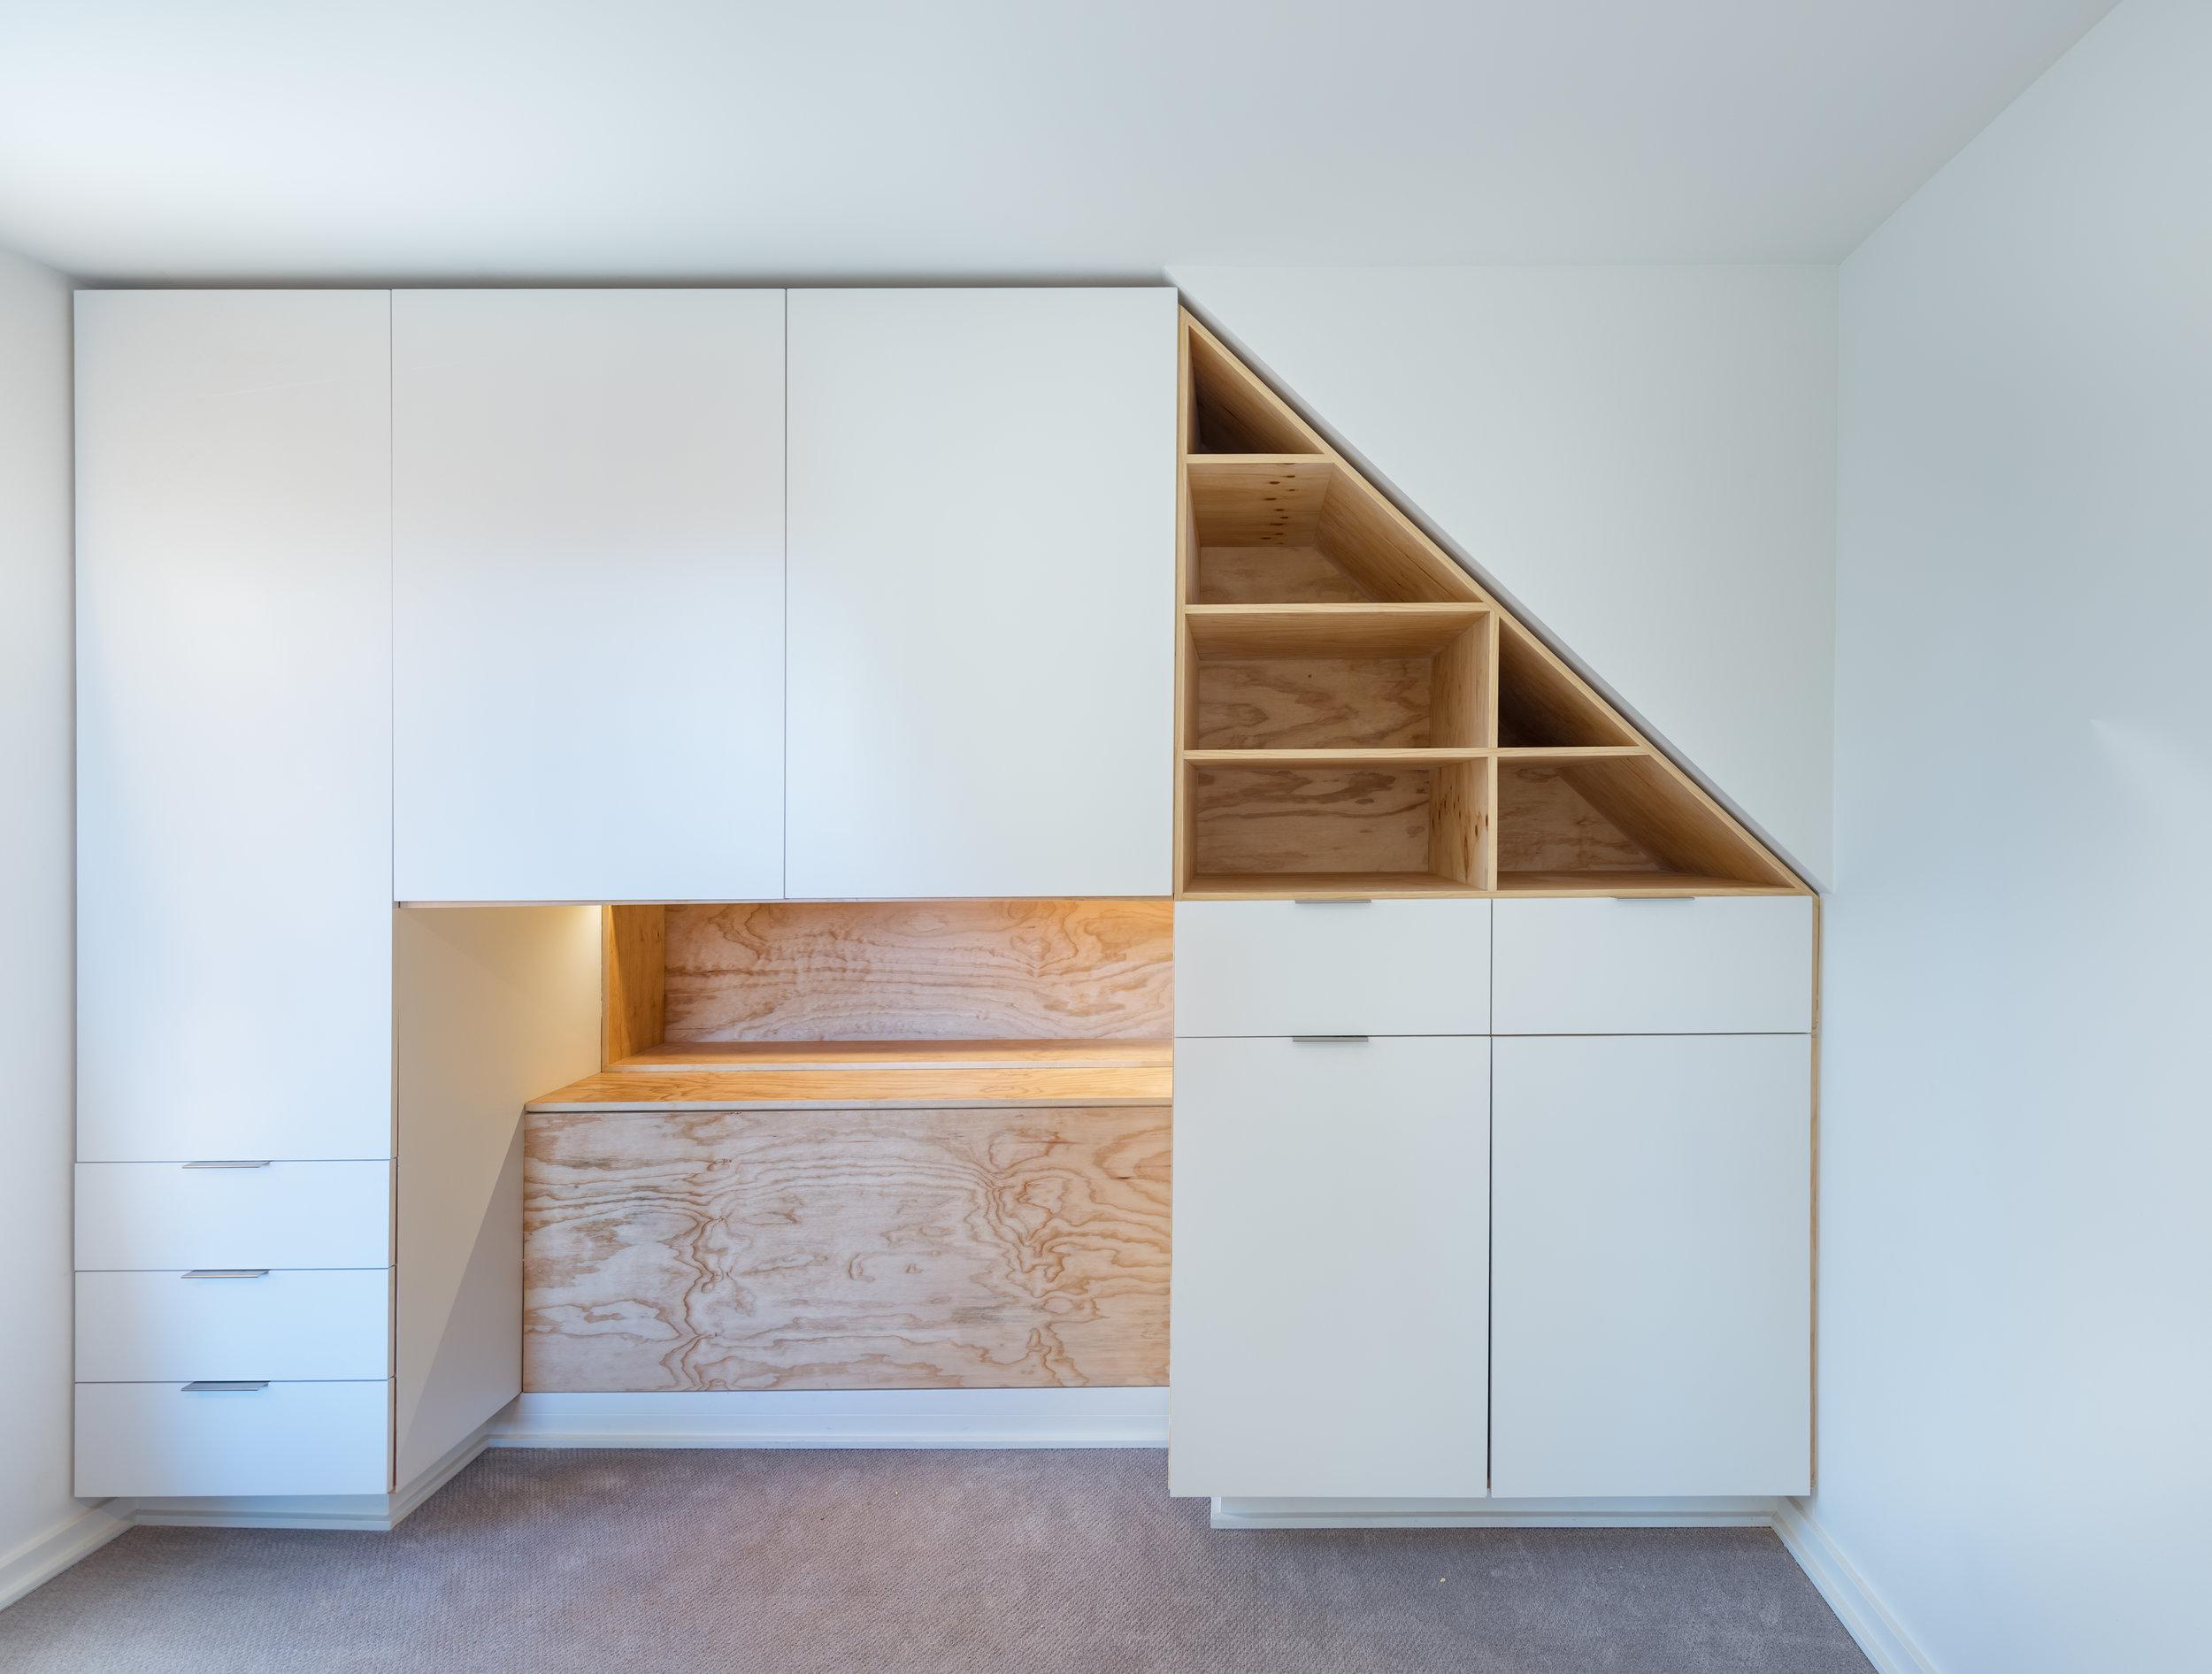 13 Bedroom Cabinets.jpg